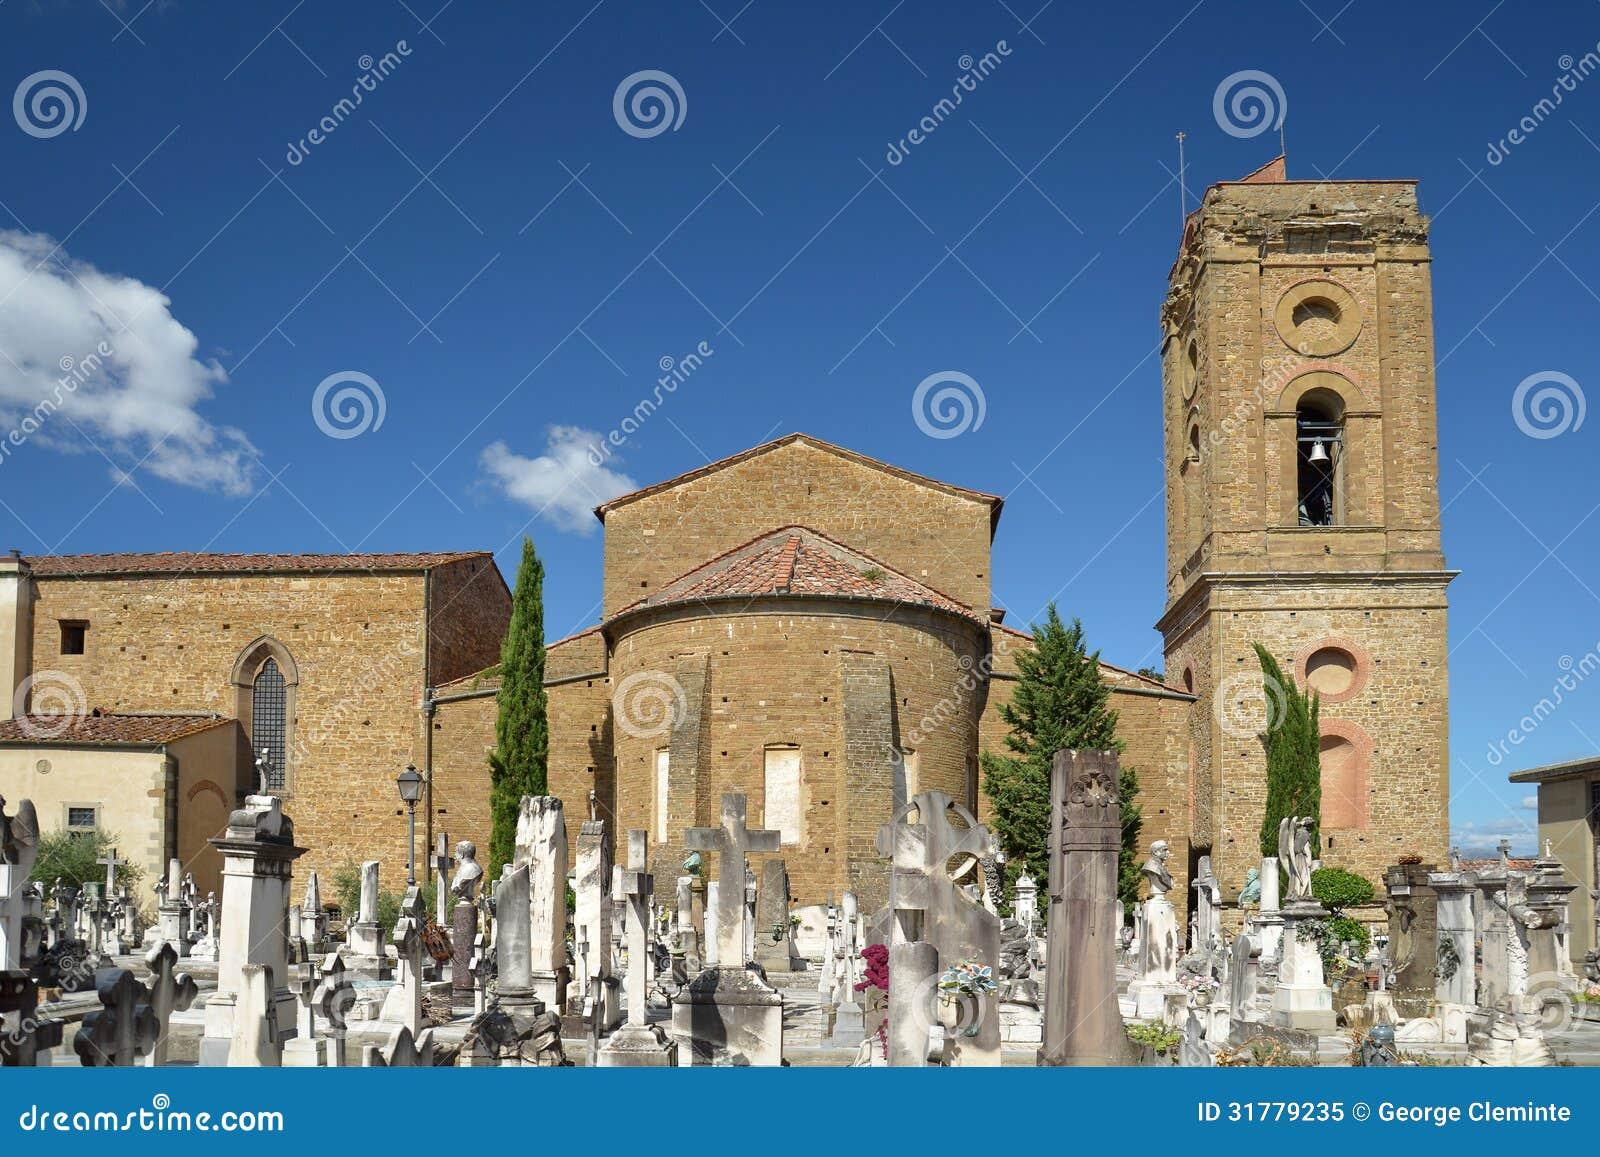 porte sante cemetery and san miniato basilica in florence